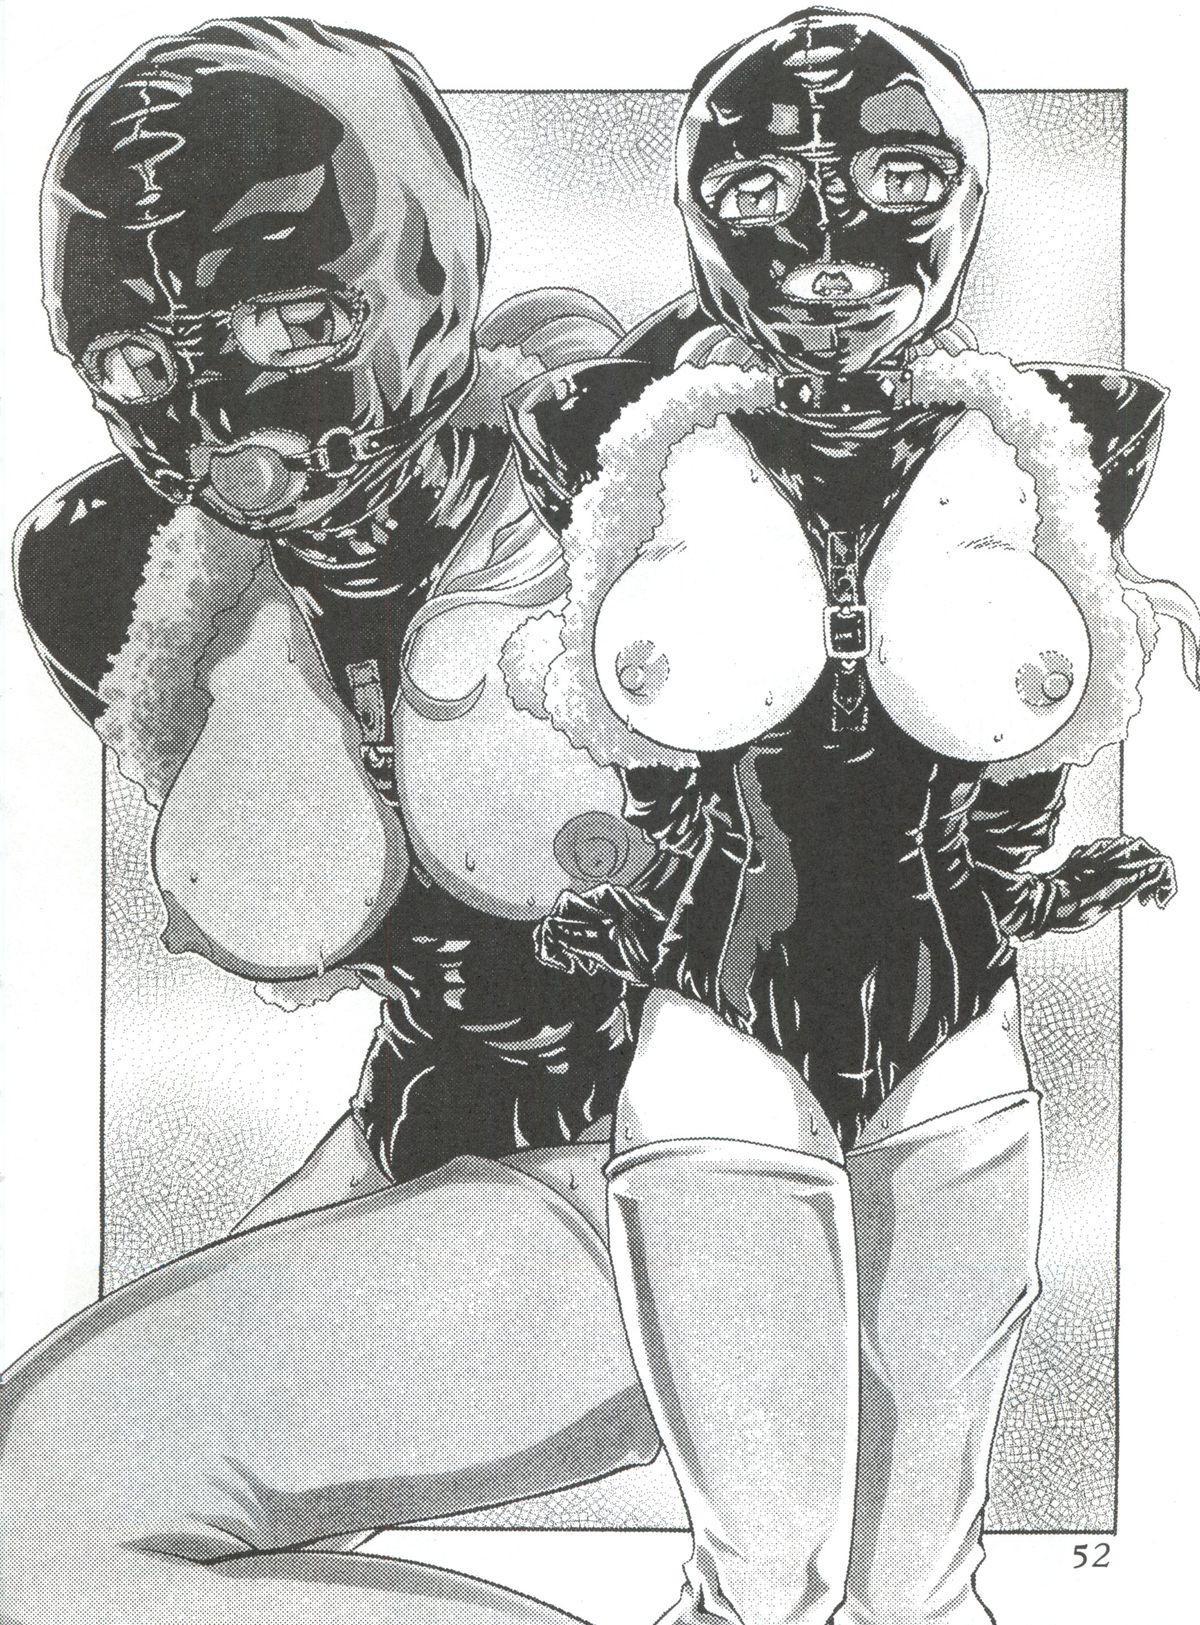 Meika Azumaya Vol.4 50